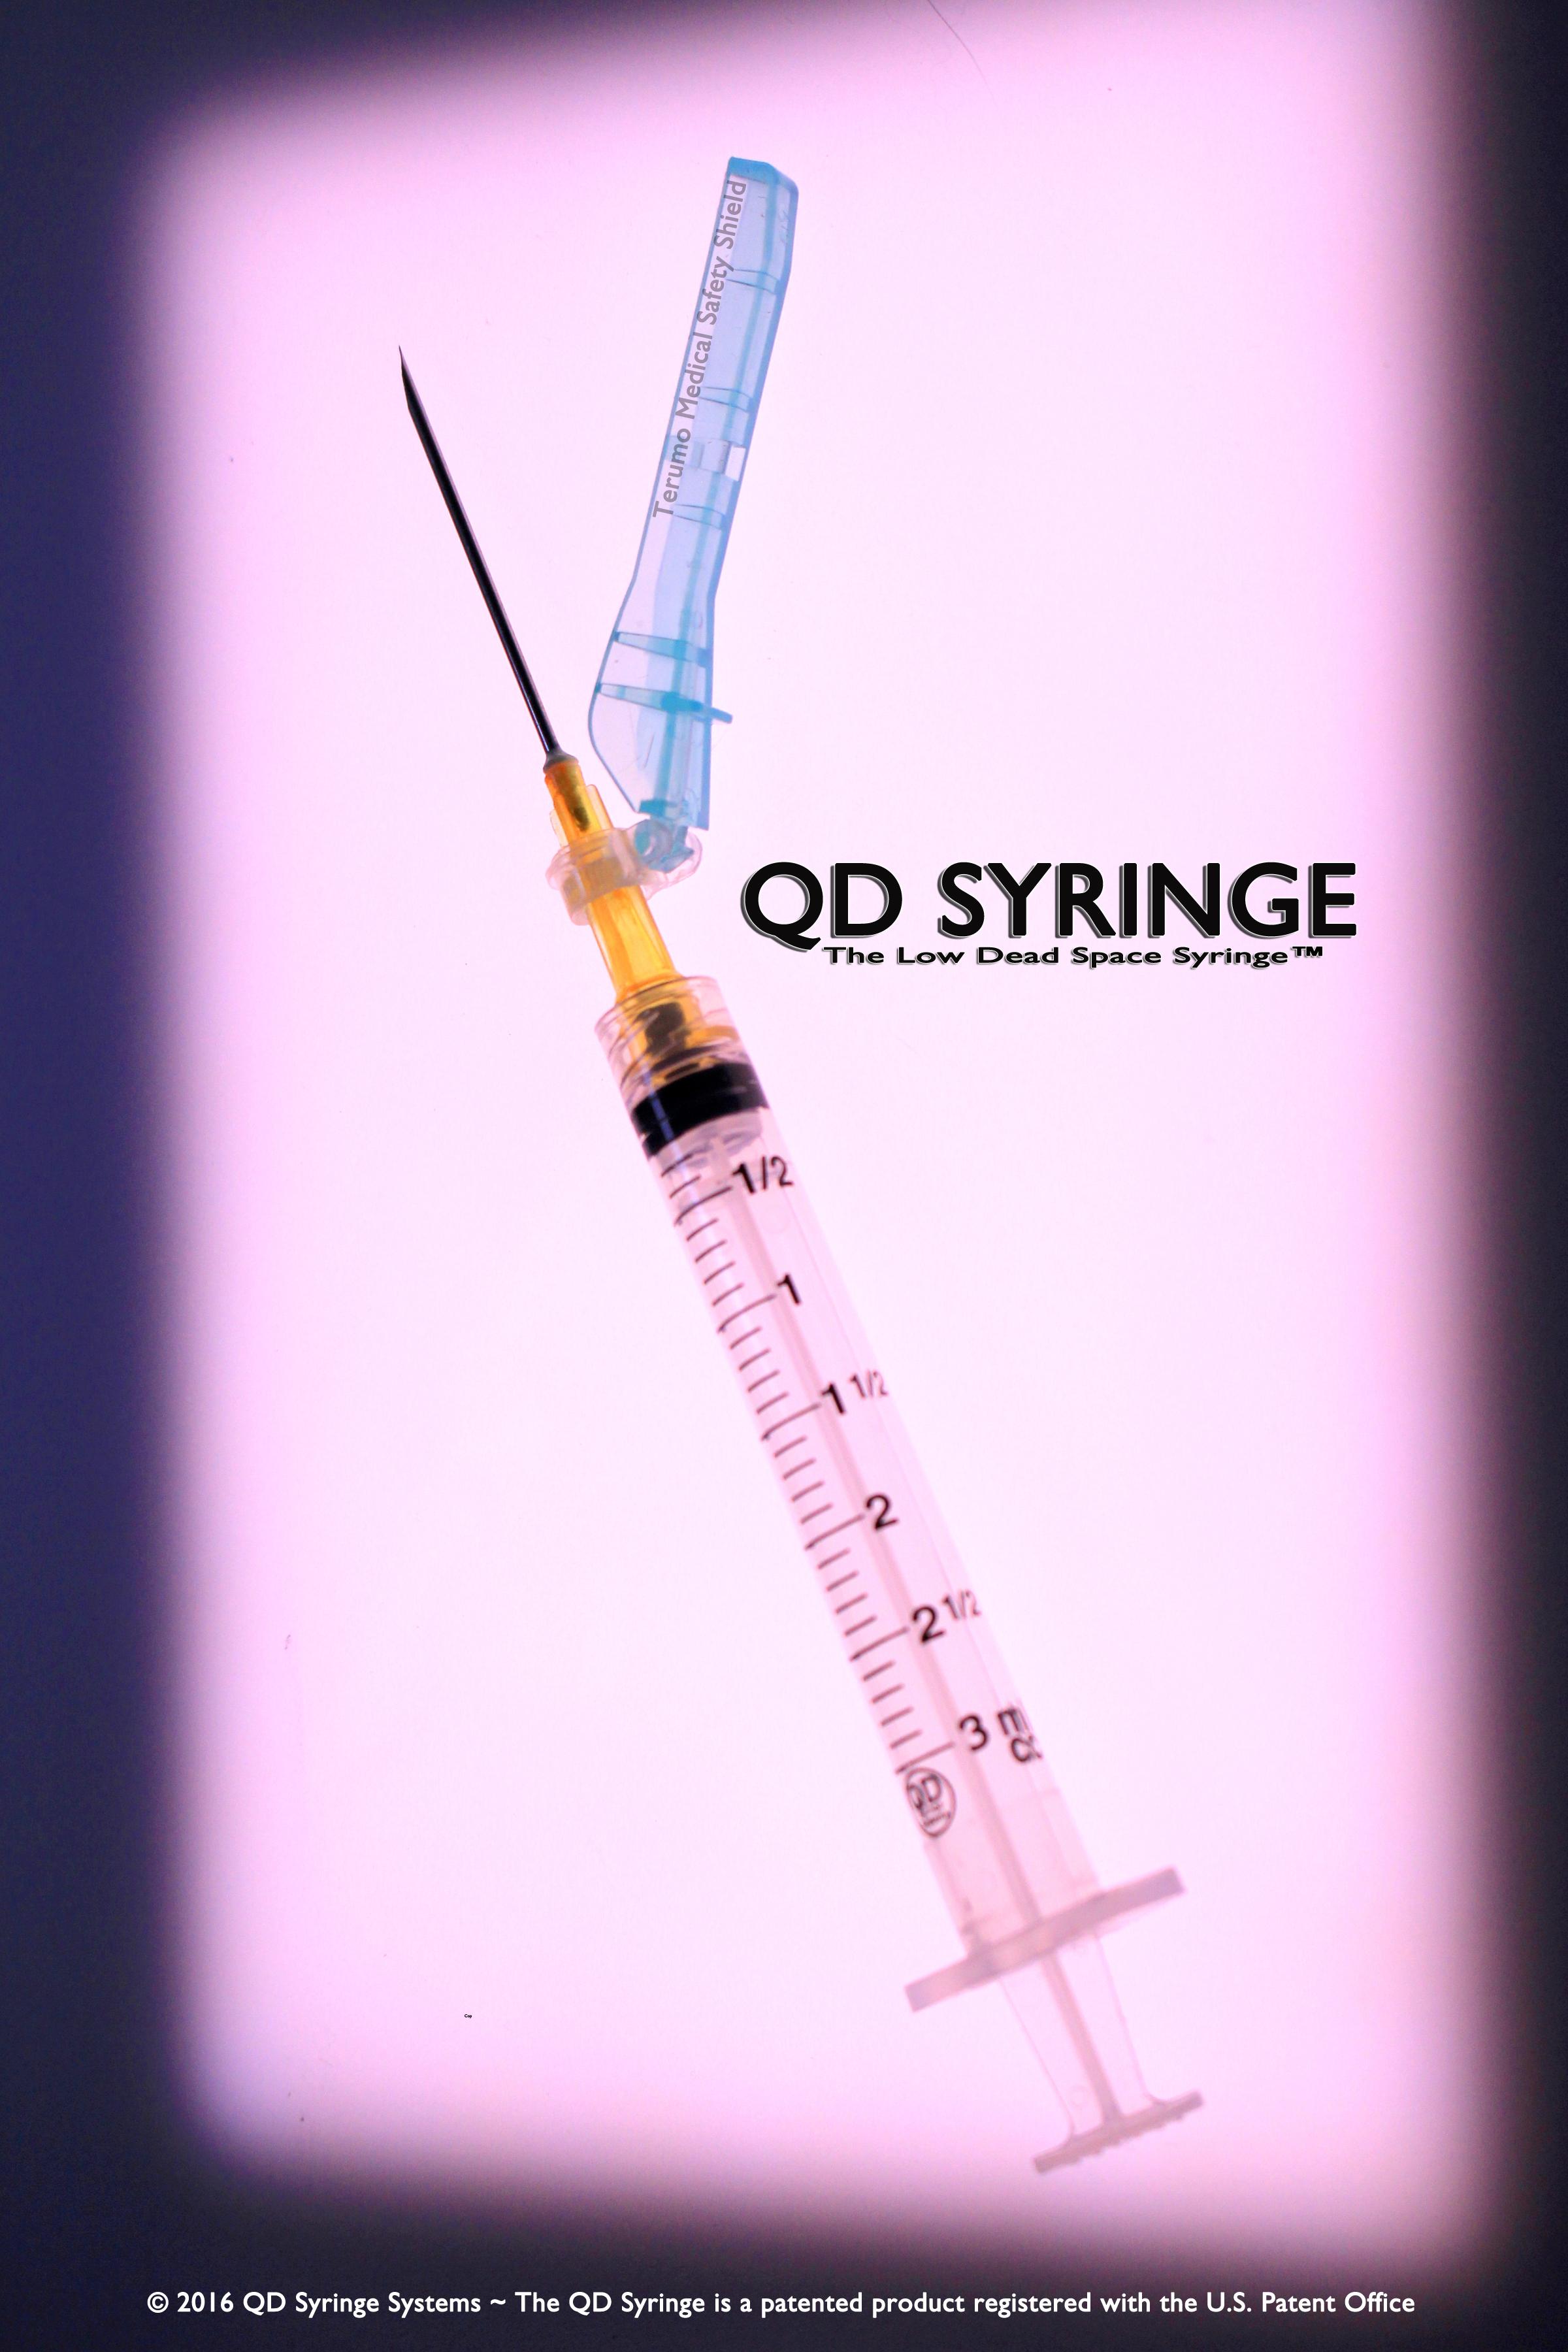 qd-syringe-qd-syringe-systems-quick-draw-syringe